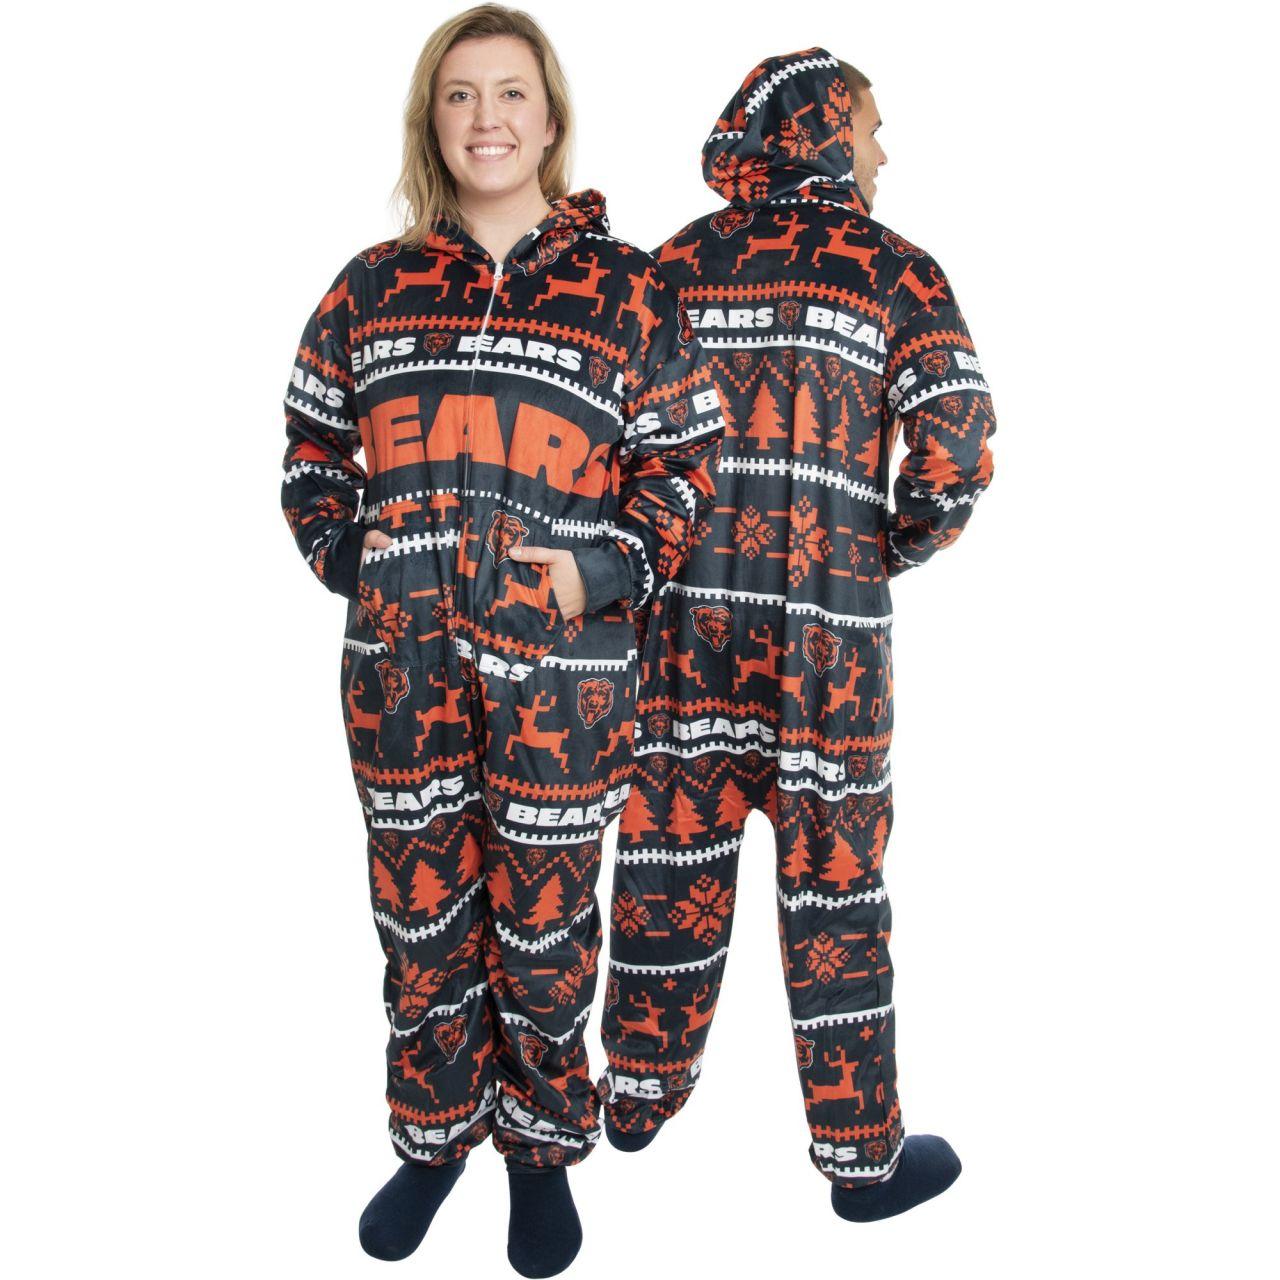 amfoo - Chicago Bears NFL Winter XMAS Hooded One Piece Anzug